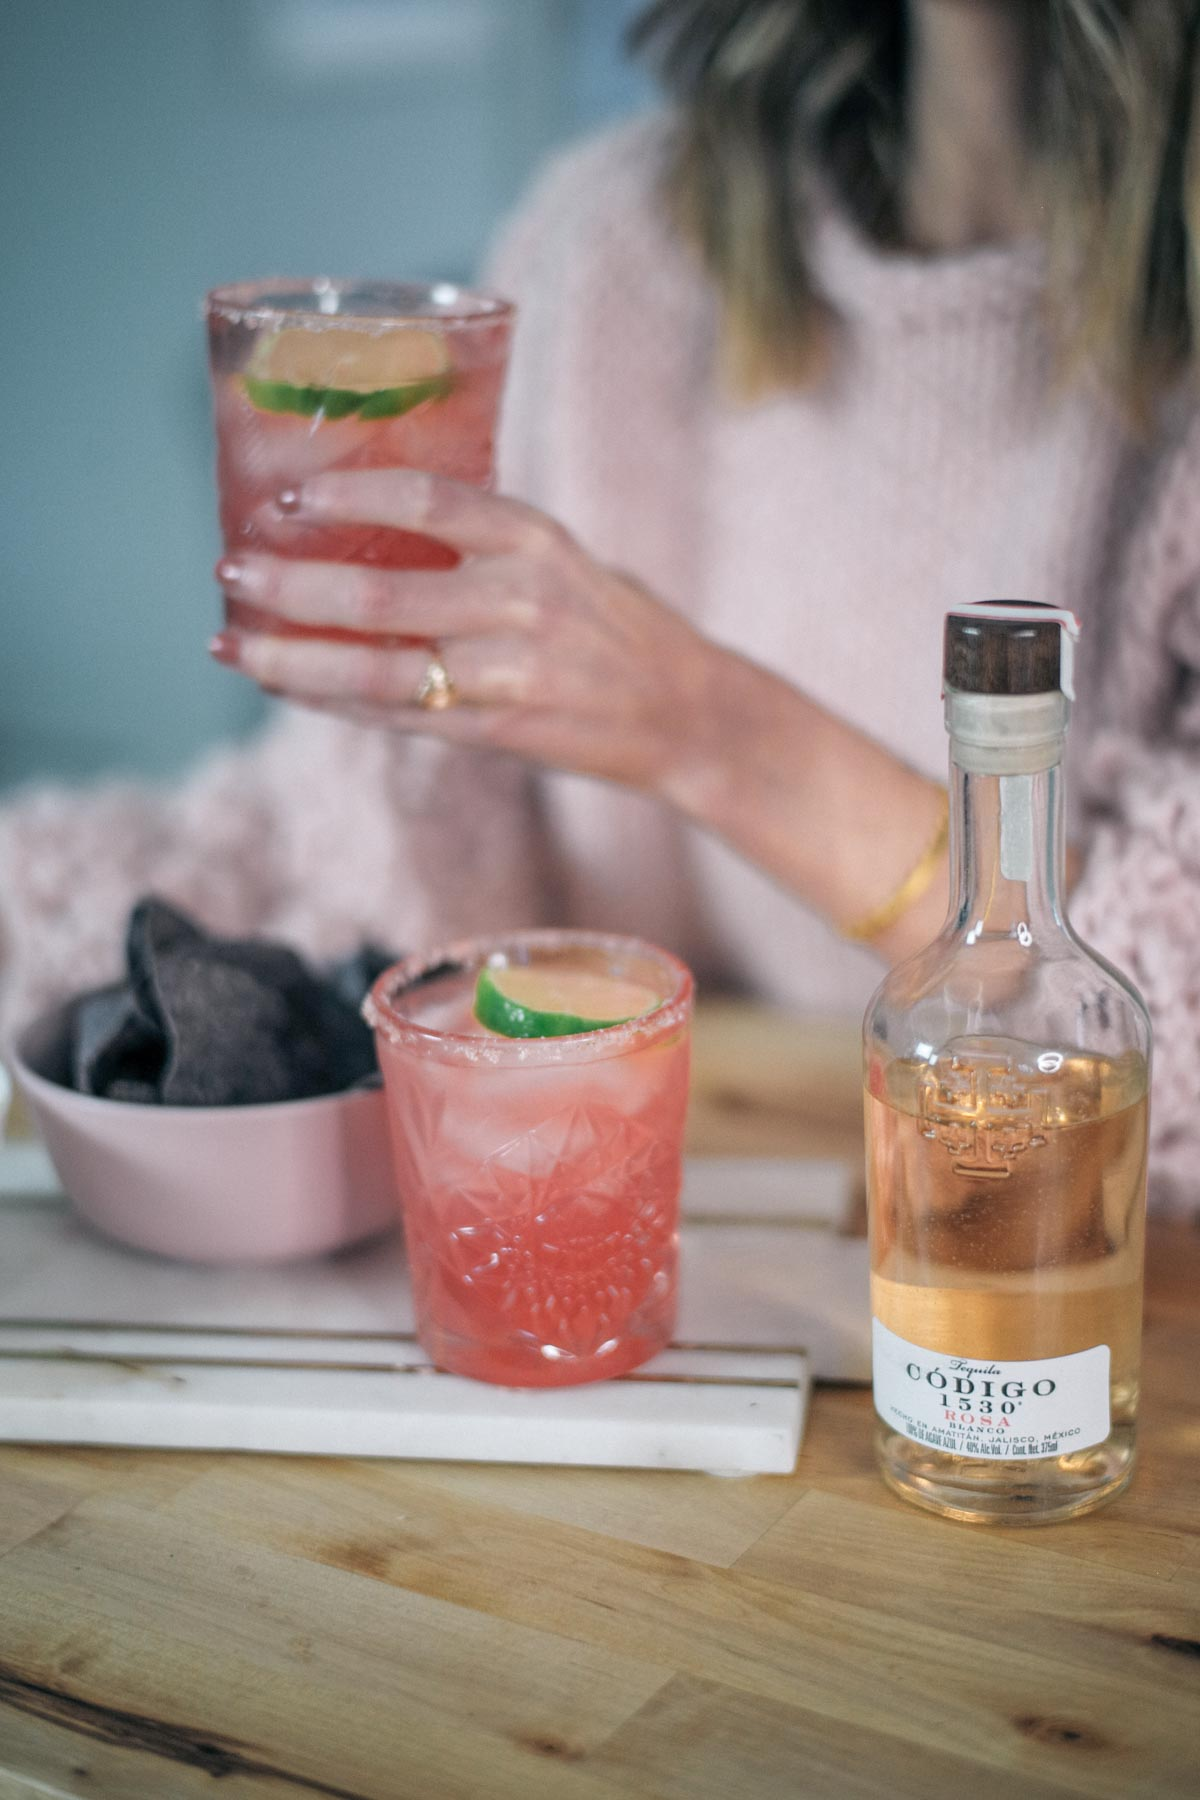 Jess Ann Kirby sips a komucha margarita in celebration of National Margarita Day